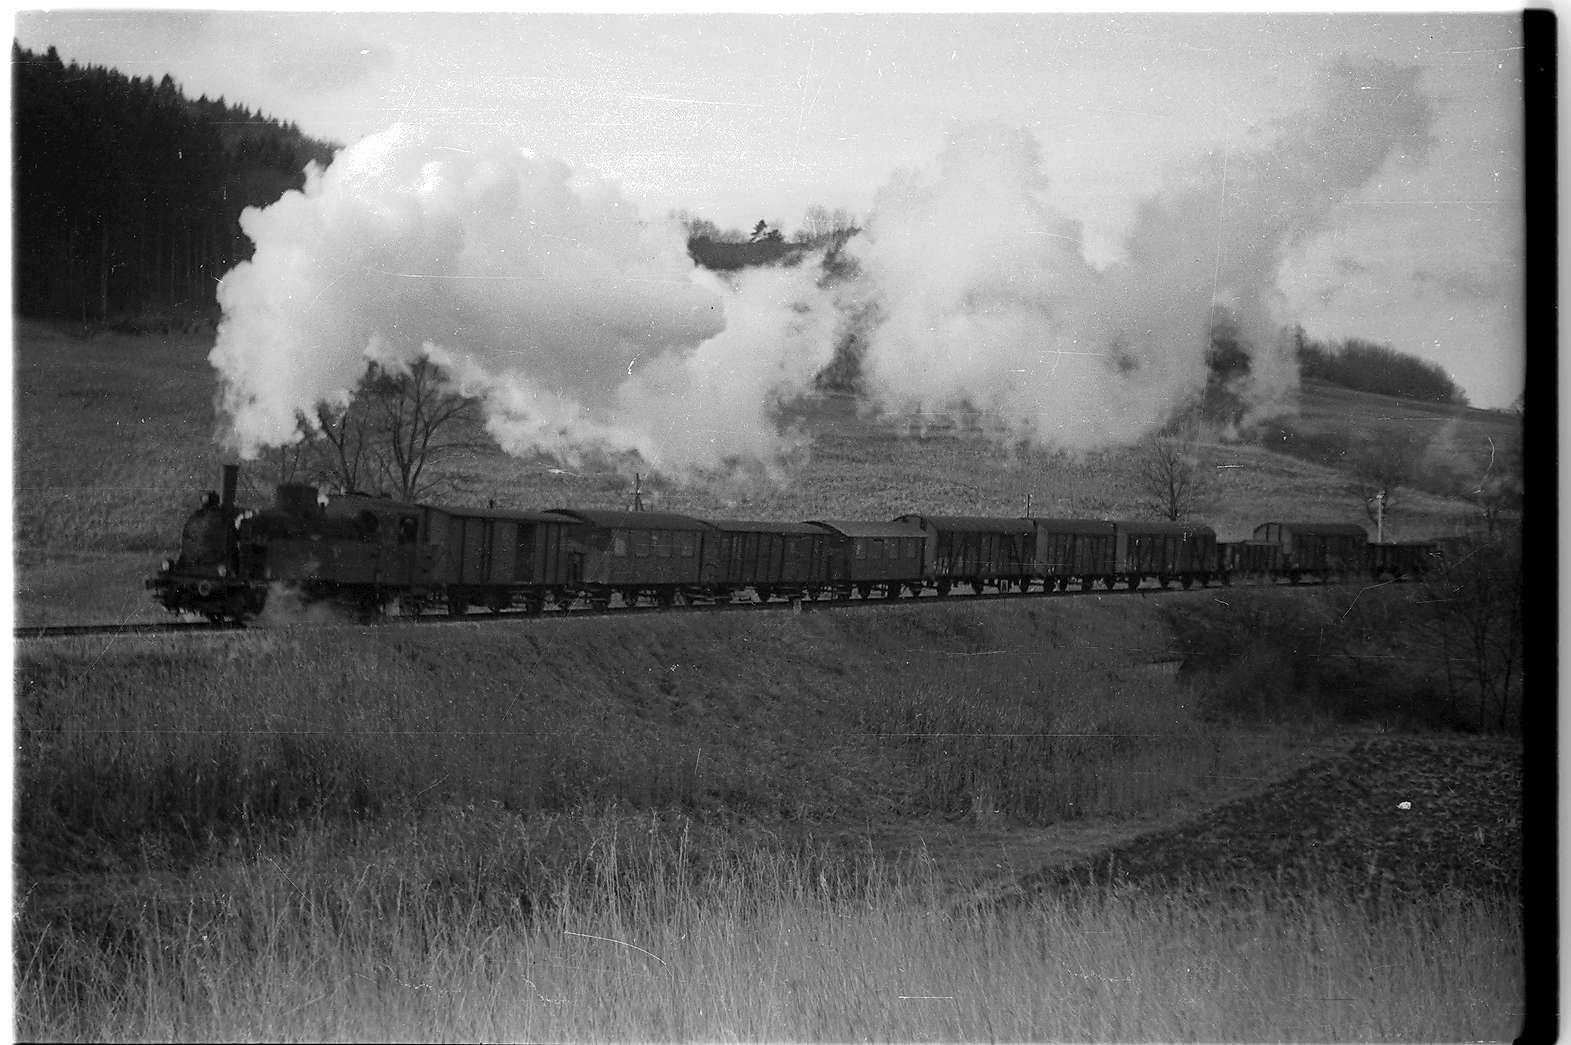 Lok 21 in voller Kraftentfaltung, mit 2 Packwagen, Strecke Jungingen - Killer, Bild 1